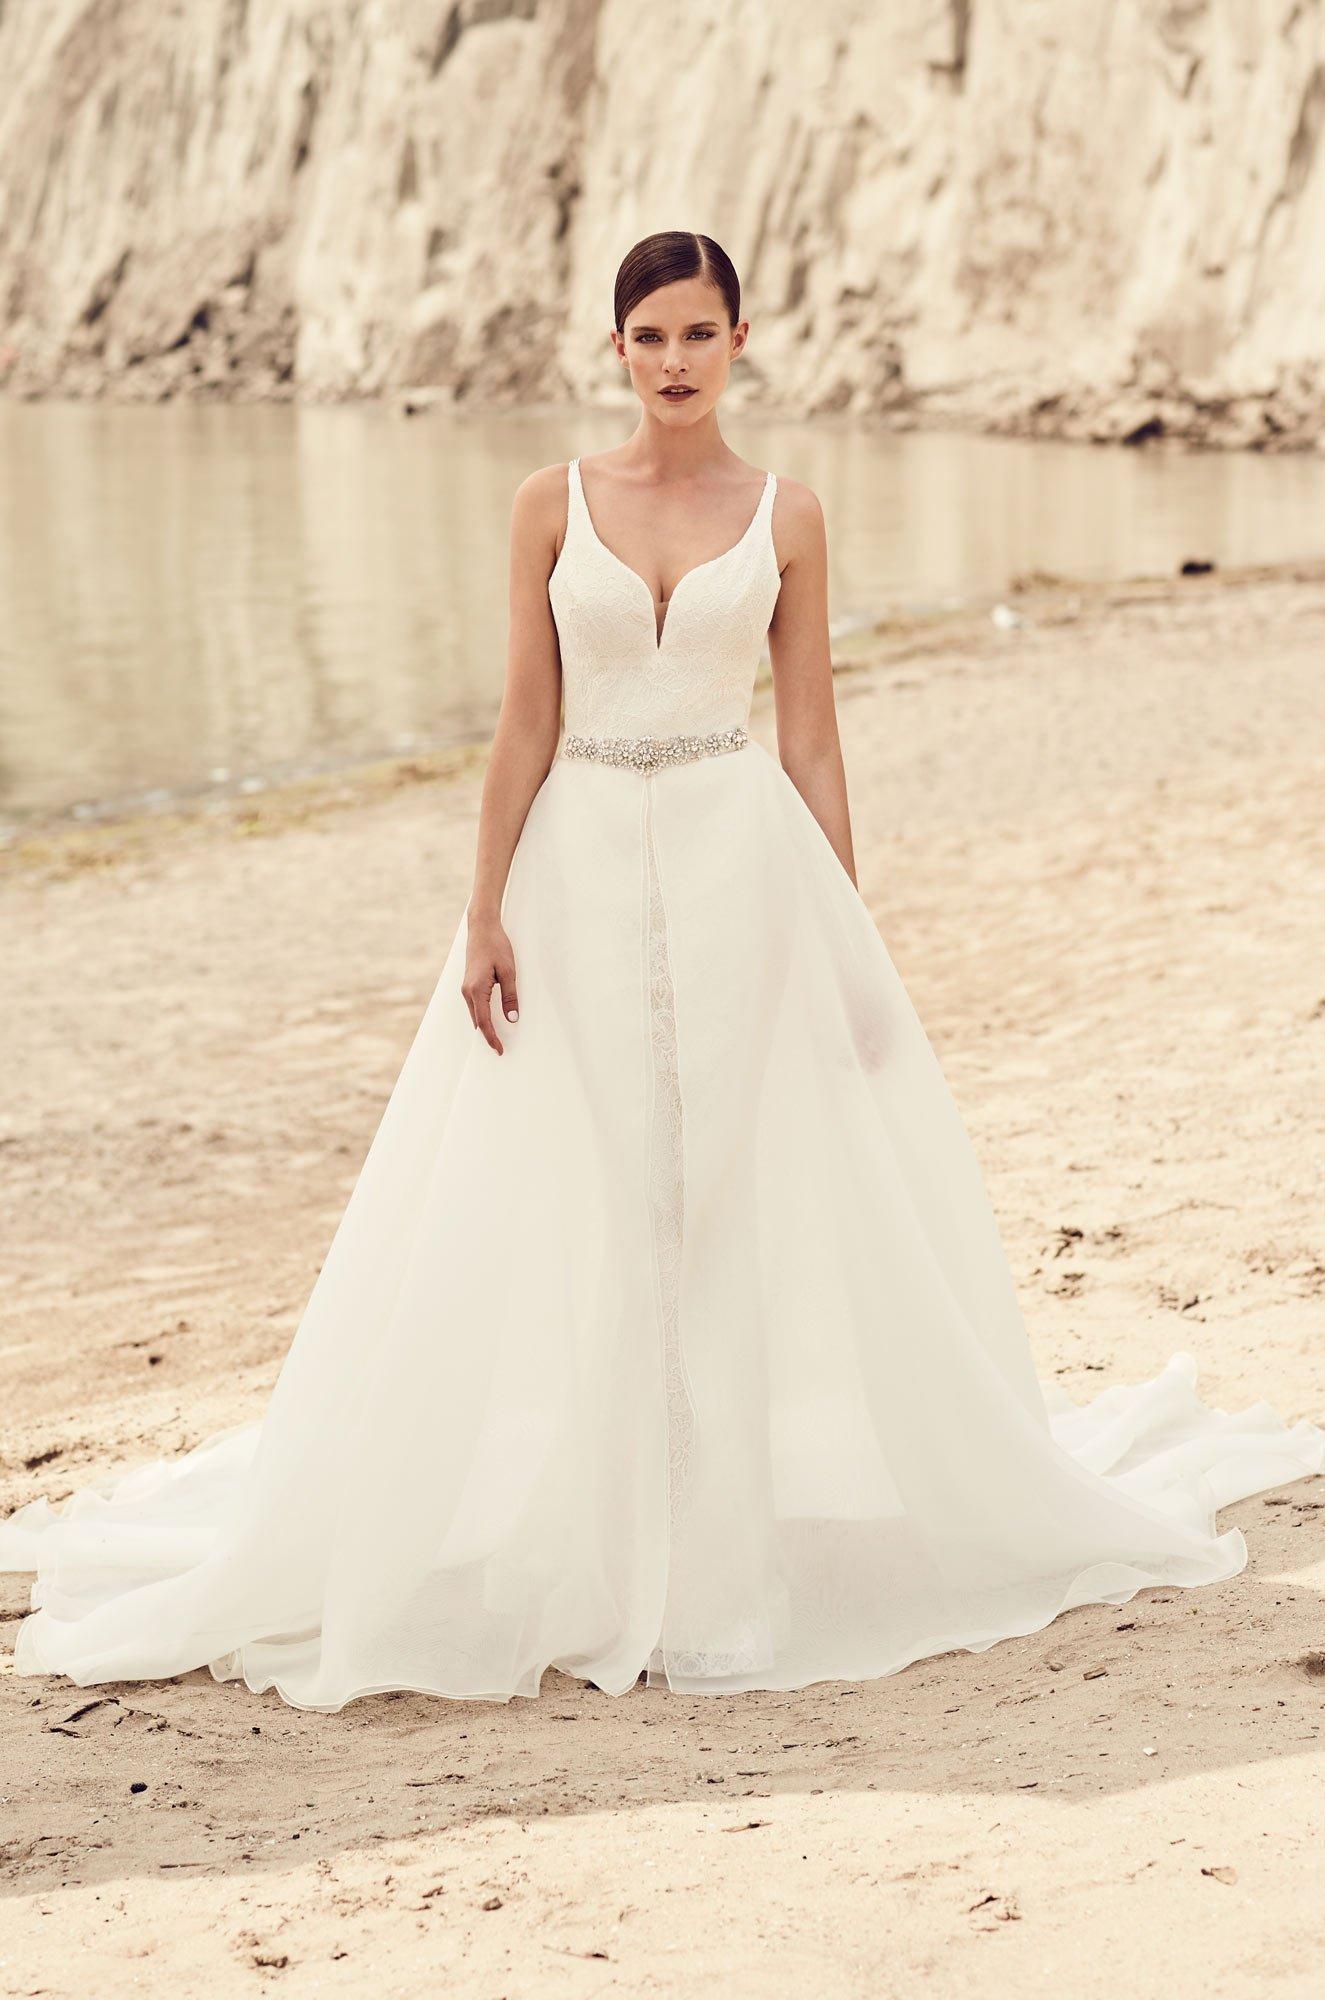 Detachable Organza Skirt Wedding Dress - Style #2120 | Mikaella Bridal